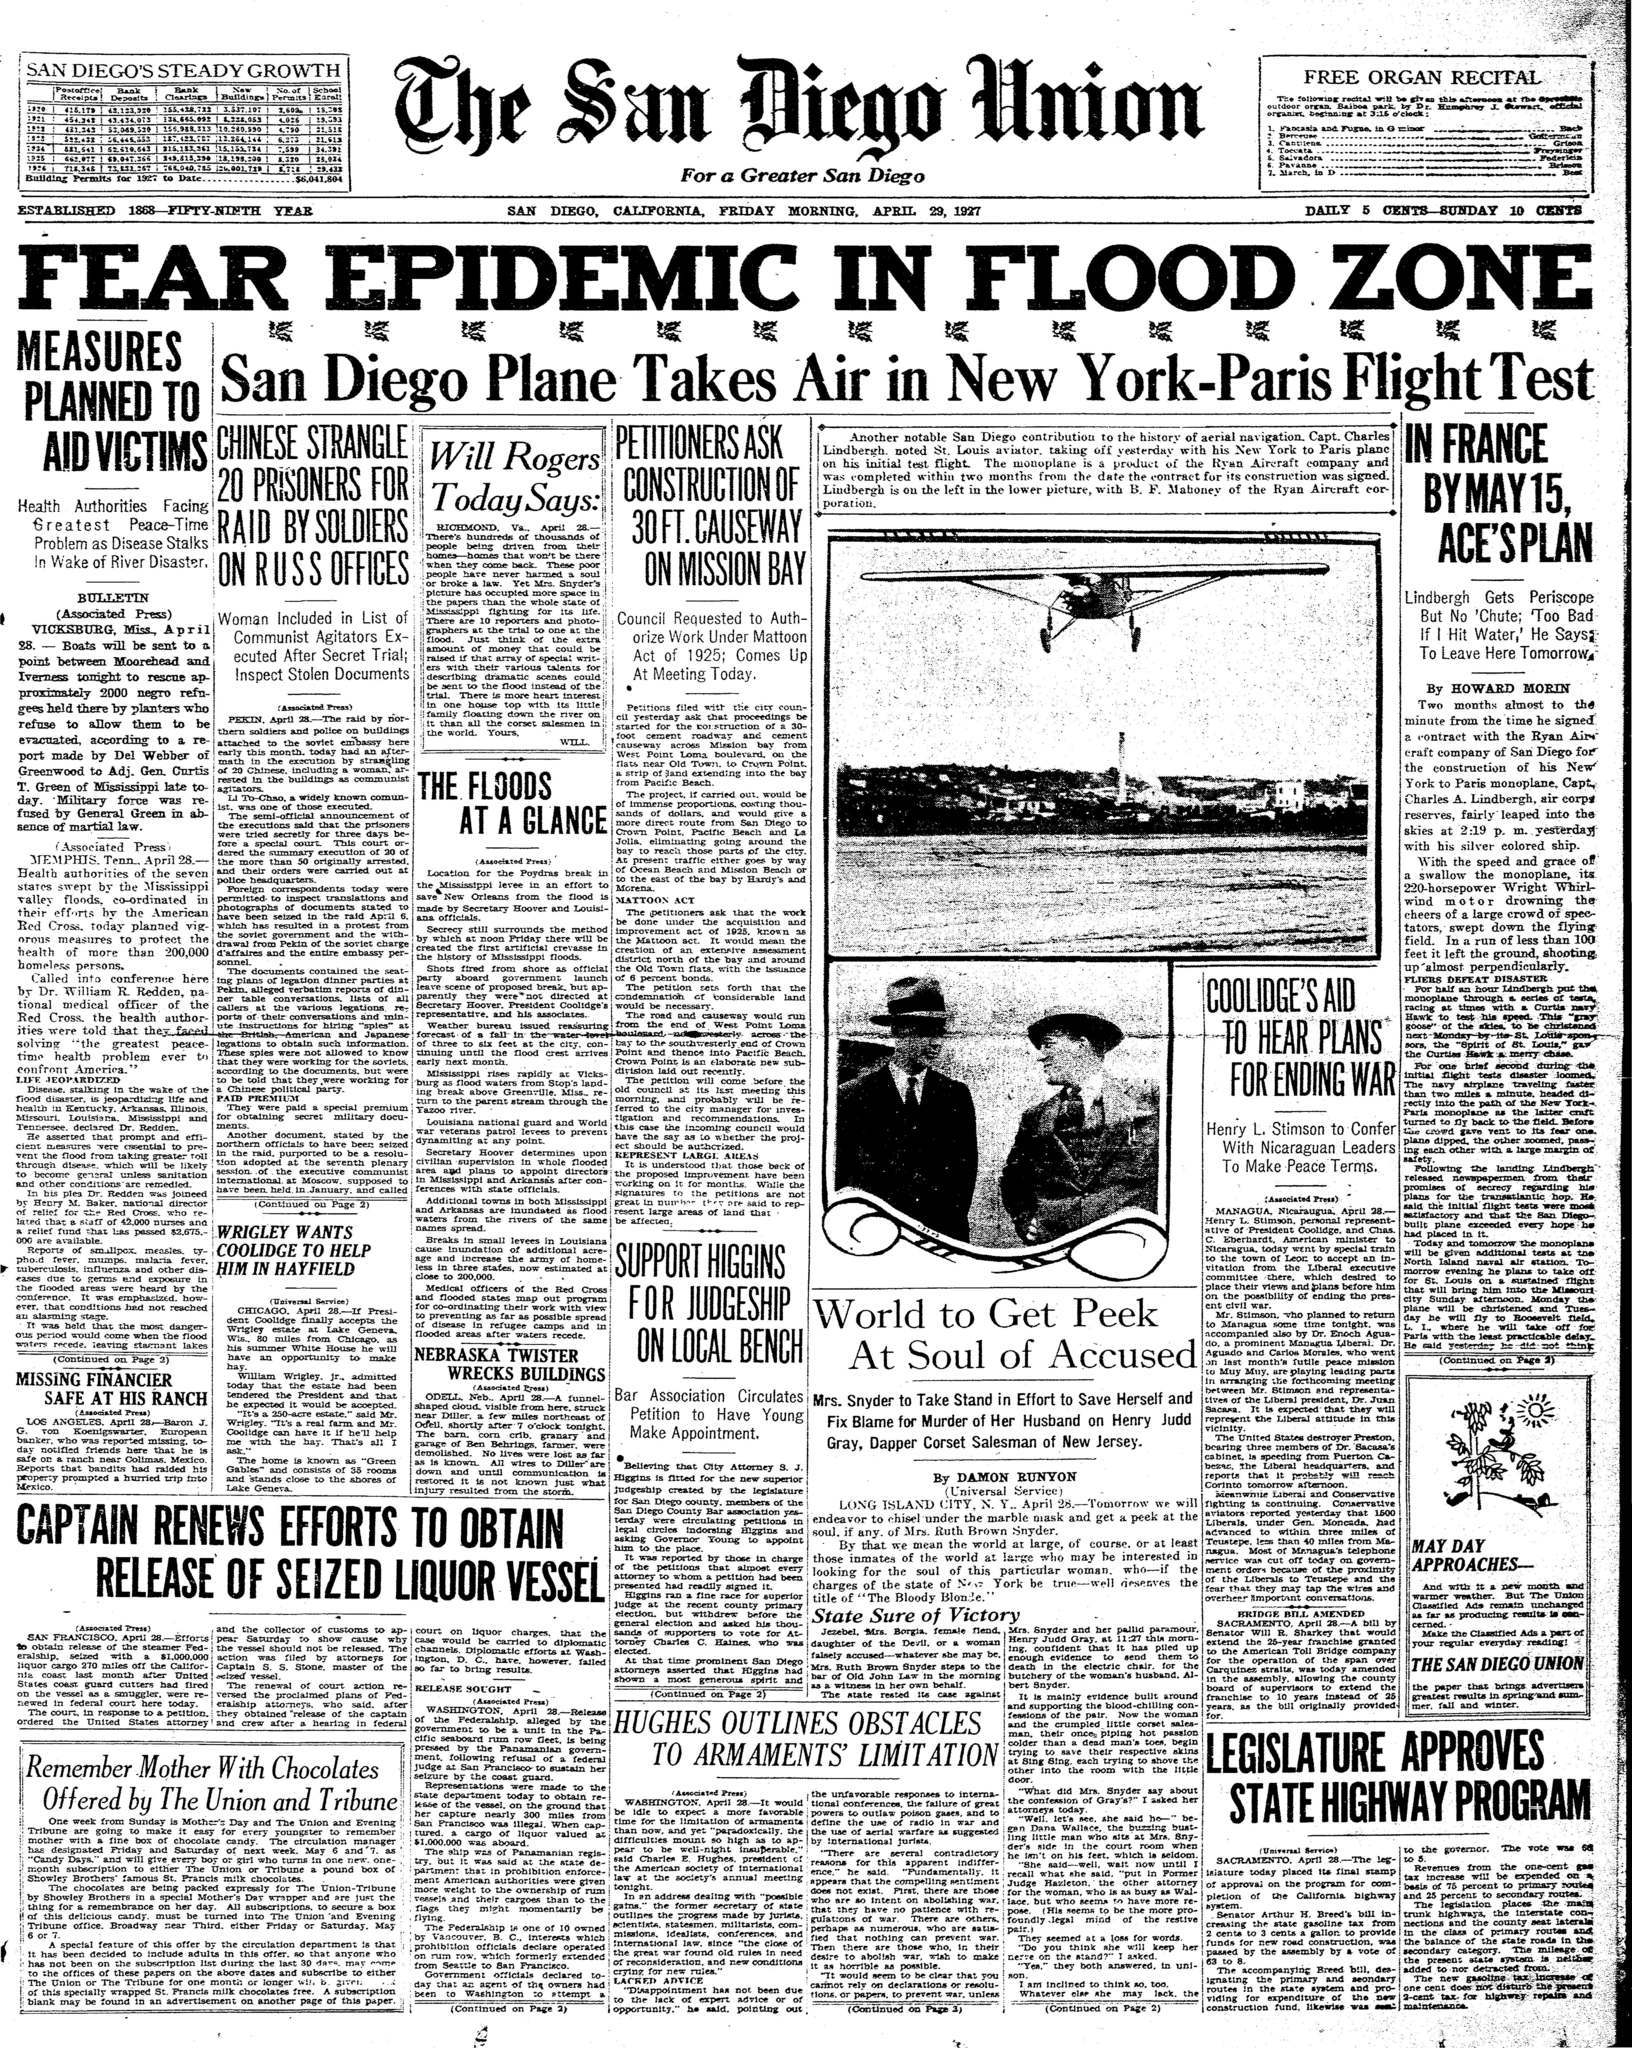 April 29, 1927